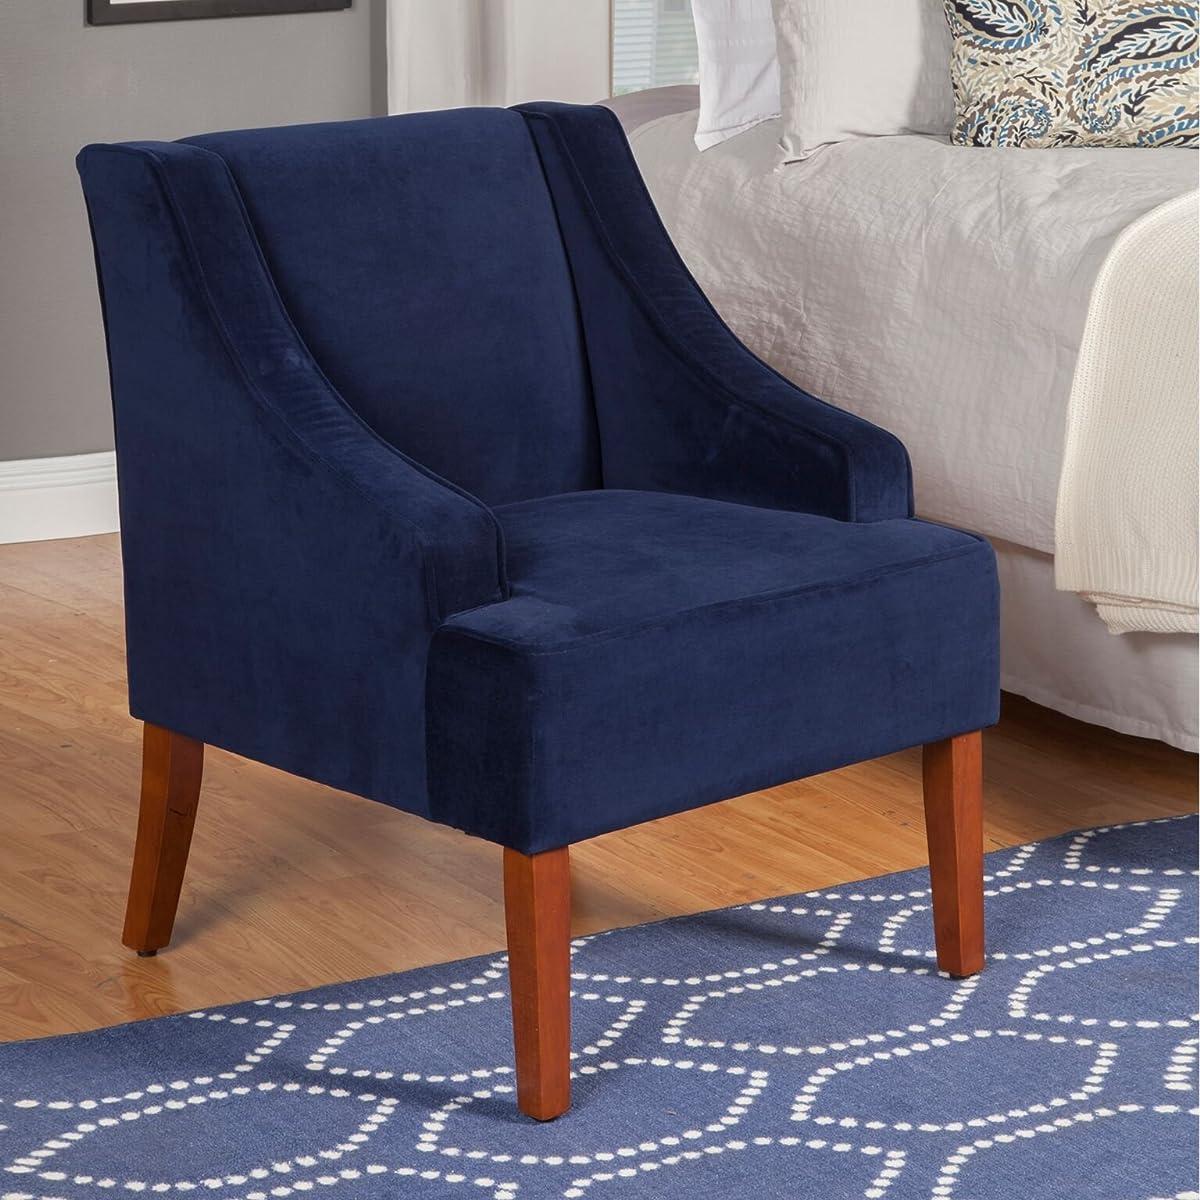 HomePop K6499-B215 Swoop Arm Accent Chair Living Room Furniture, Medium, Navy